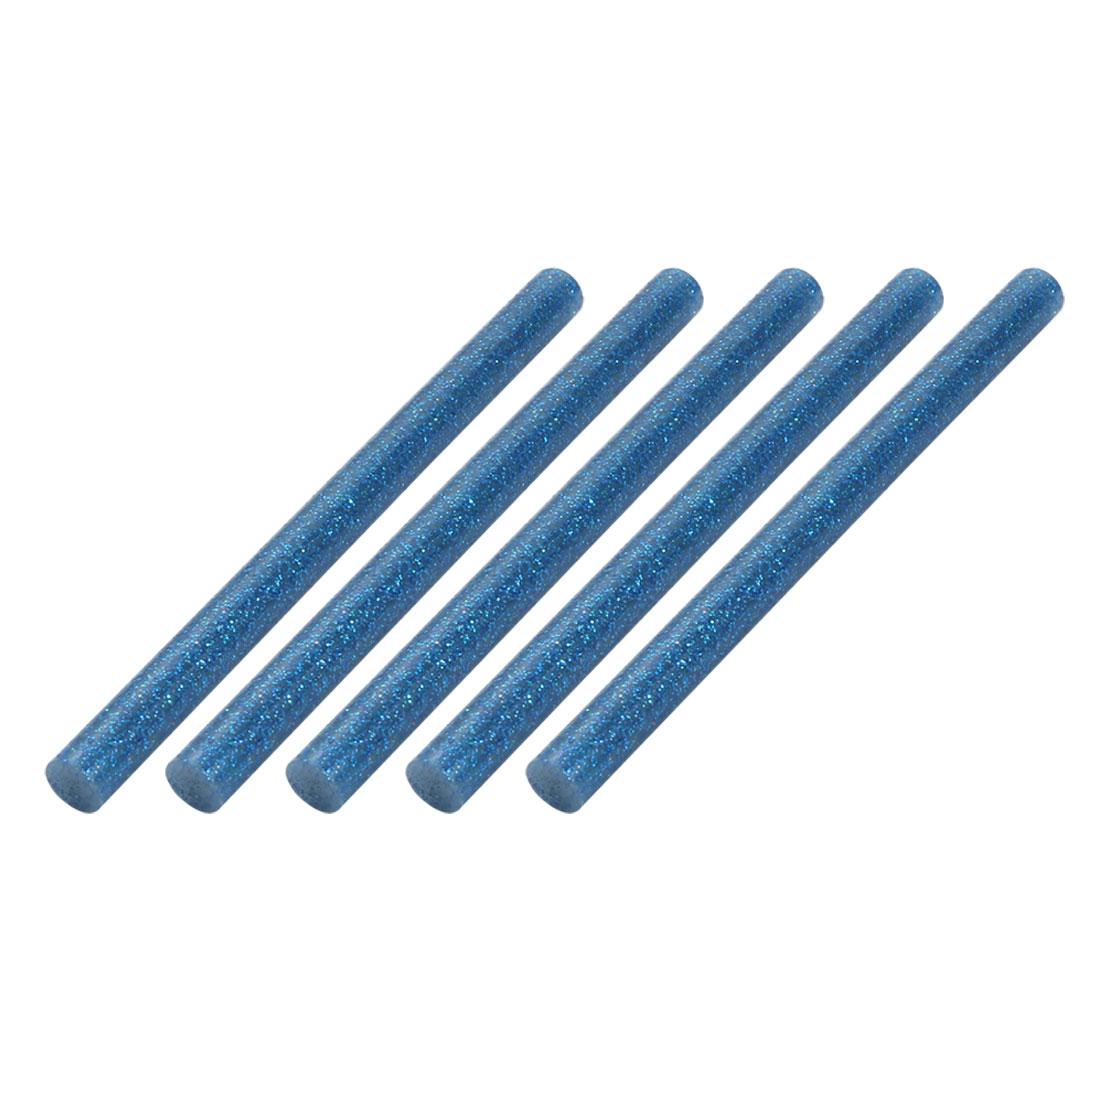 5pcs 7mm Dia 100mm Long Hot Melt Glue Adhesive Stick Blue for DIY Craft Project